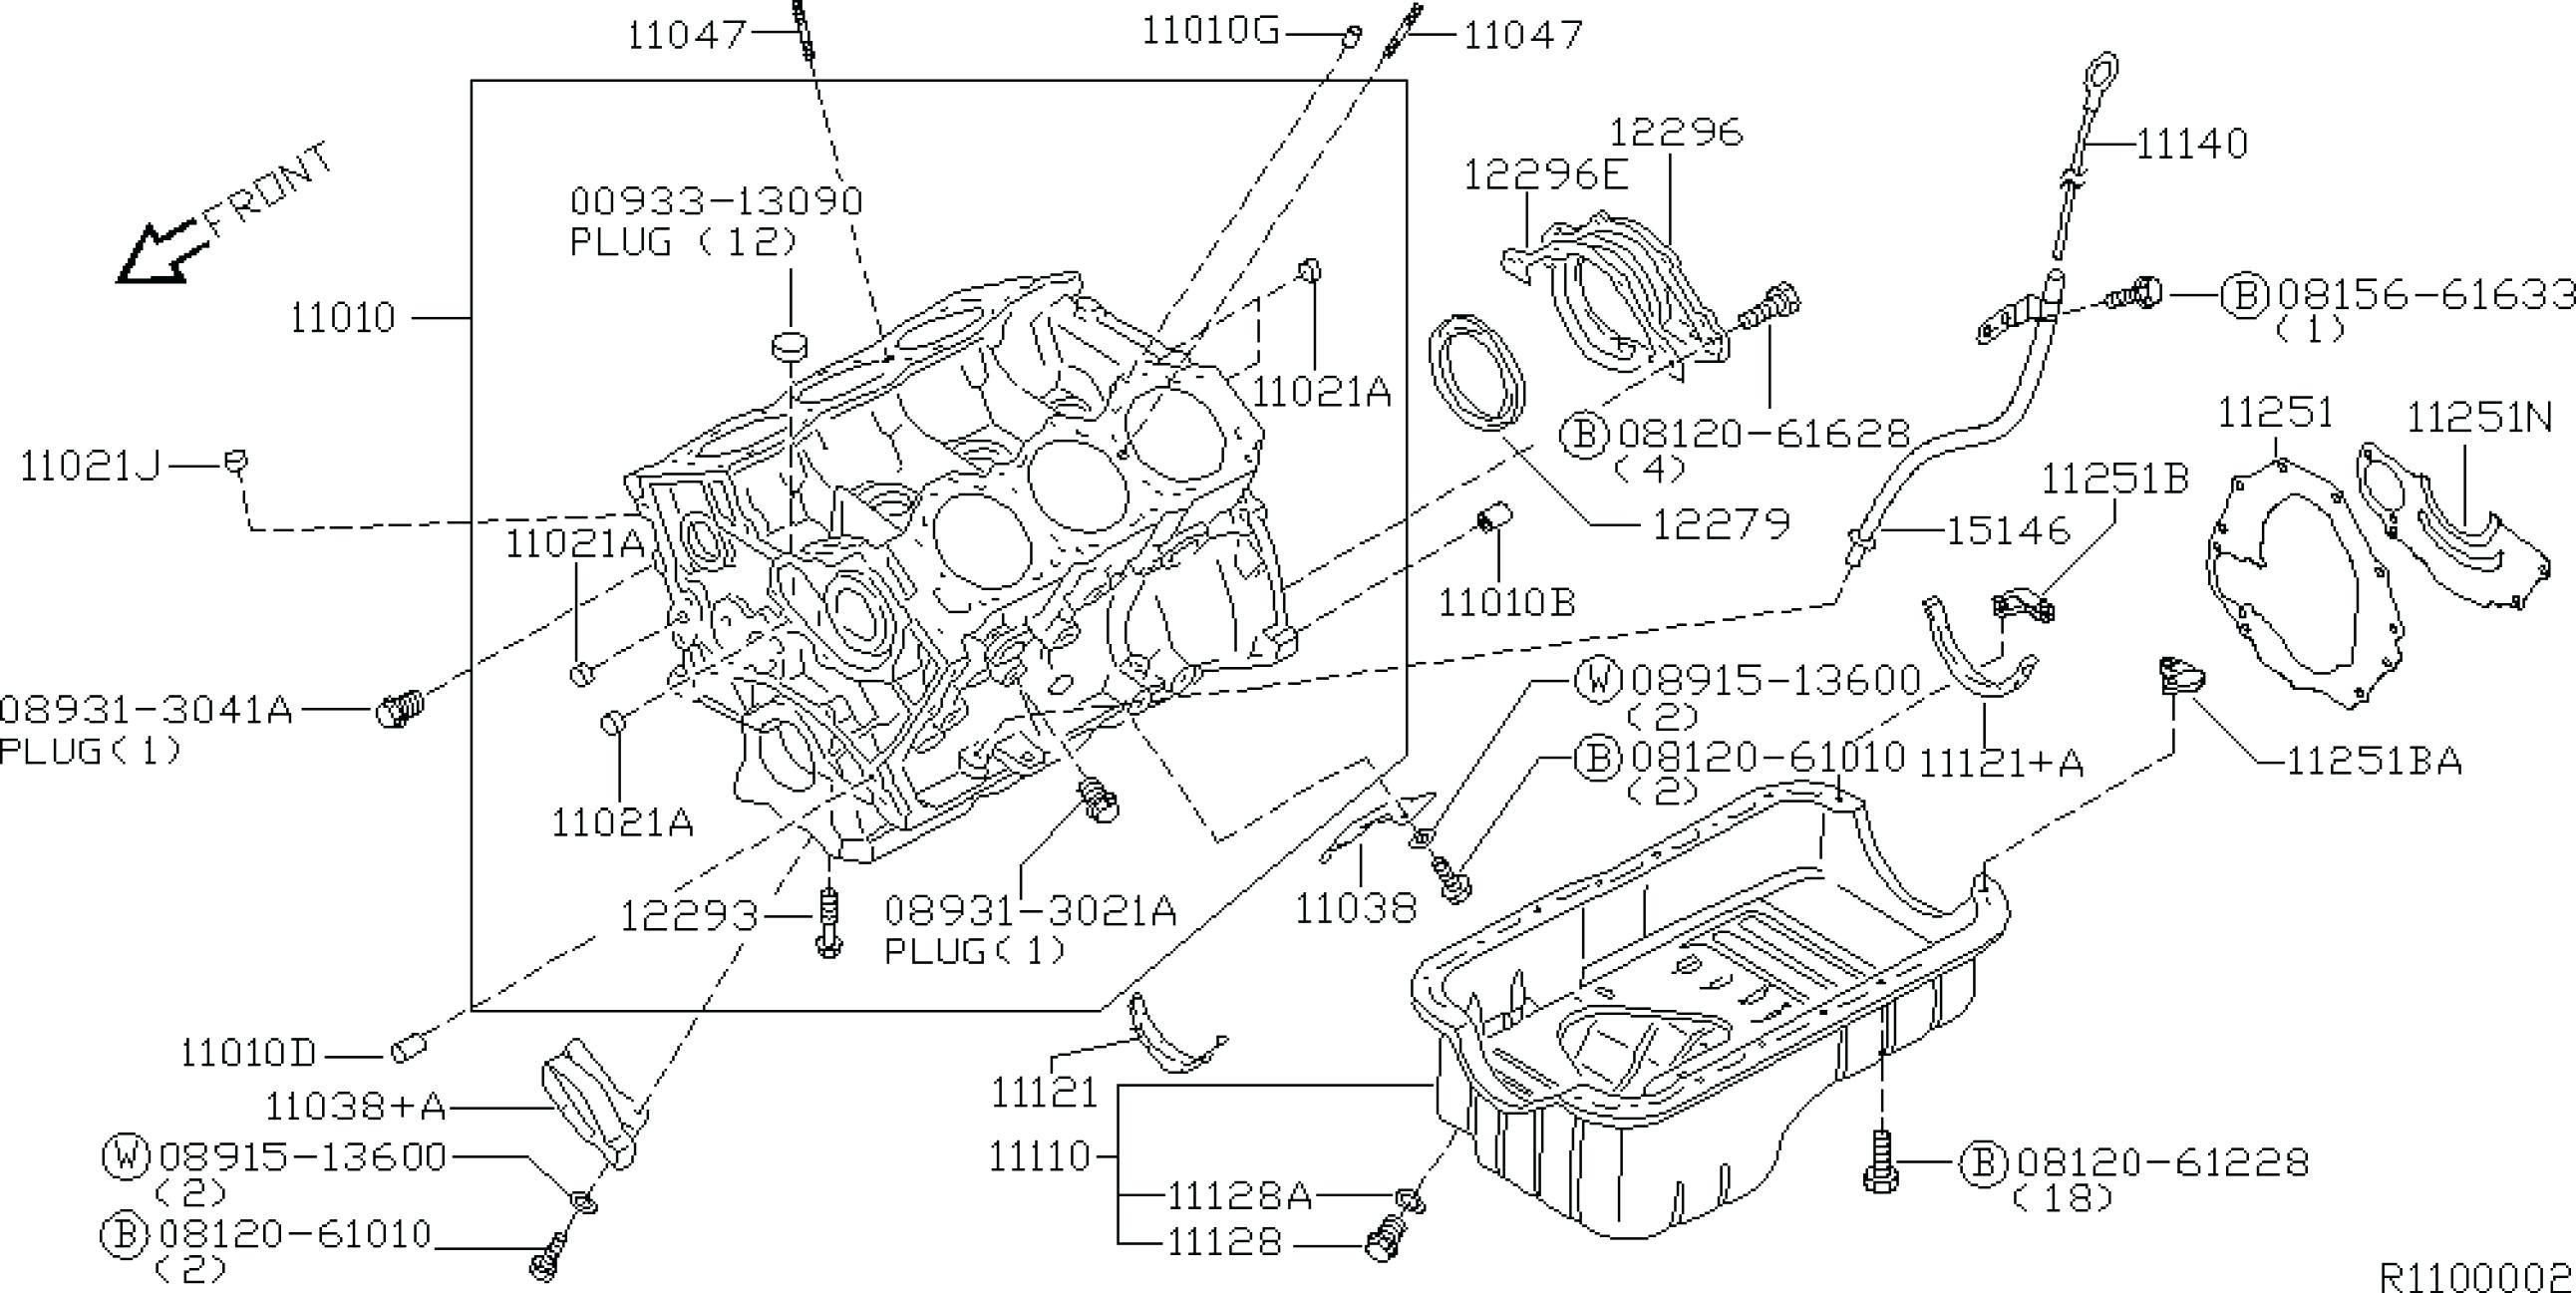 Nissan Xterra Engine Diagram Nissan Xterra Engine Diagram 2006 Maxima Ac Evaporator Resistor Of Nissan Xterra Engine Diagram